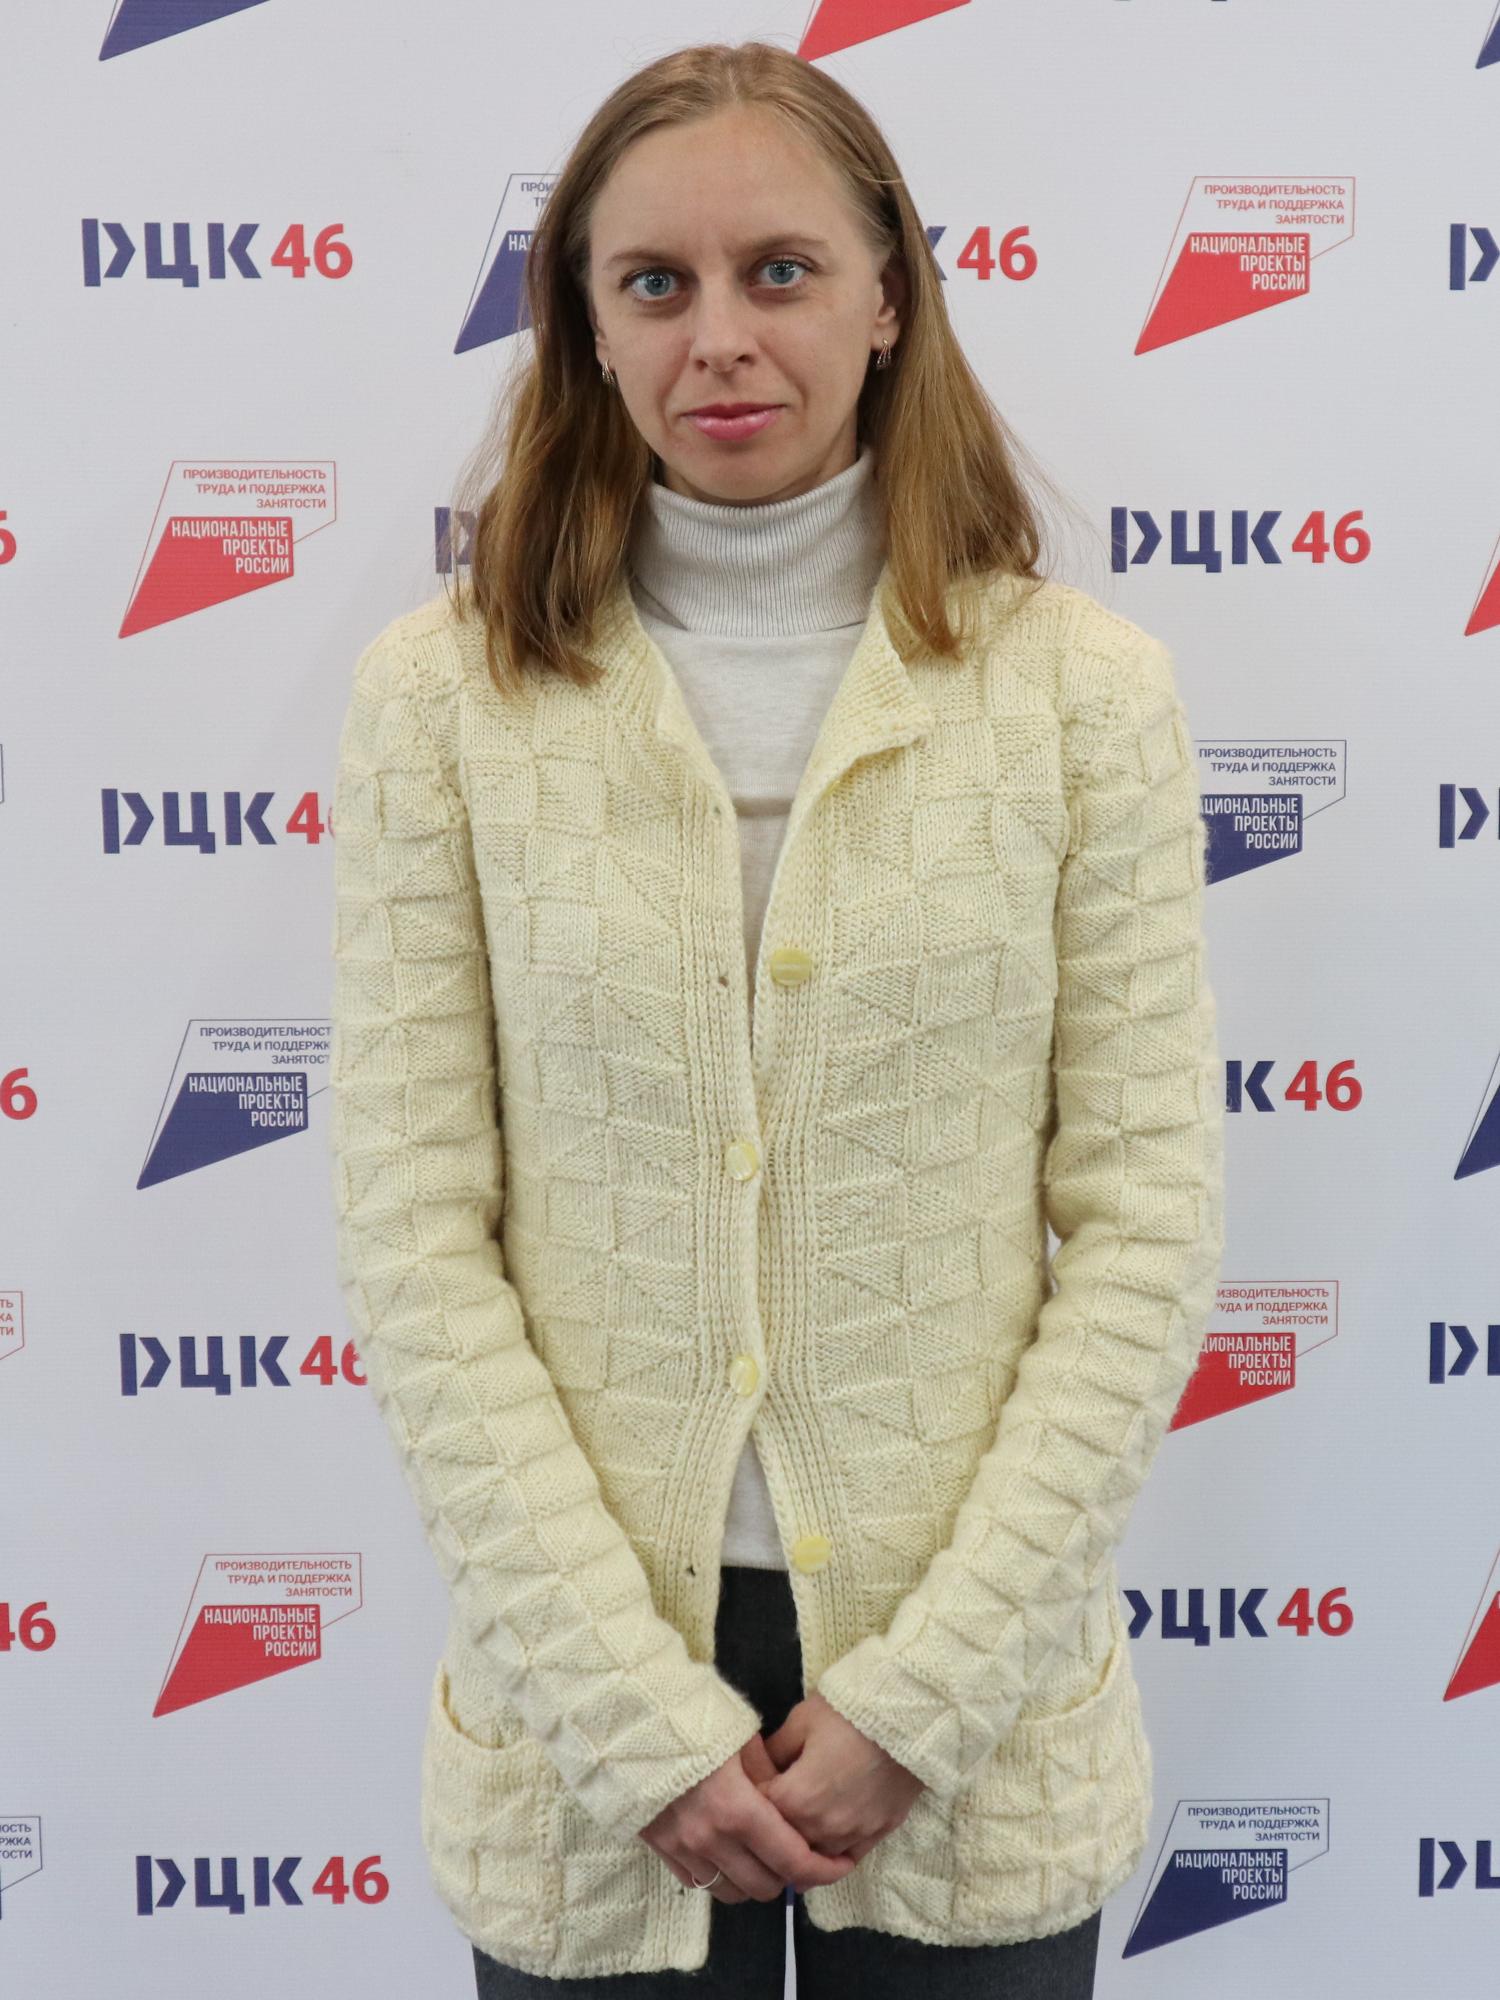 Чикулаева Светлана Викторовна